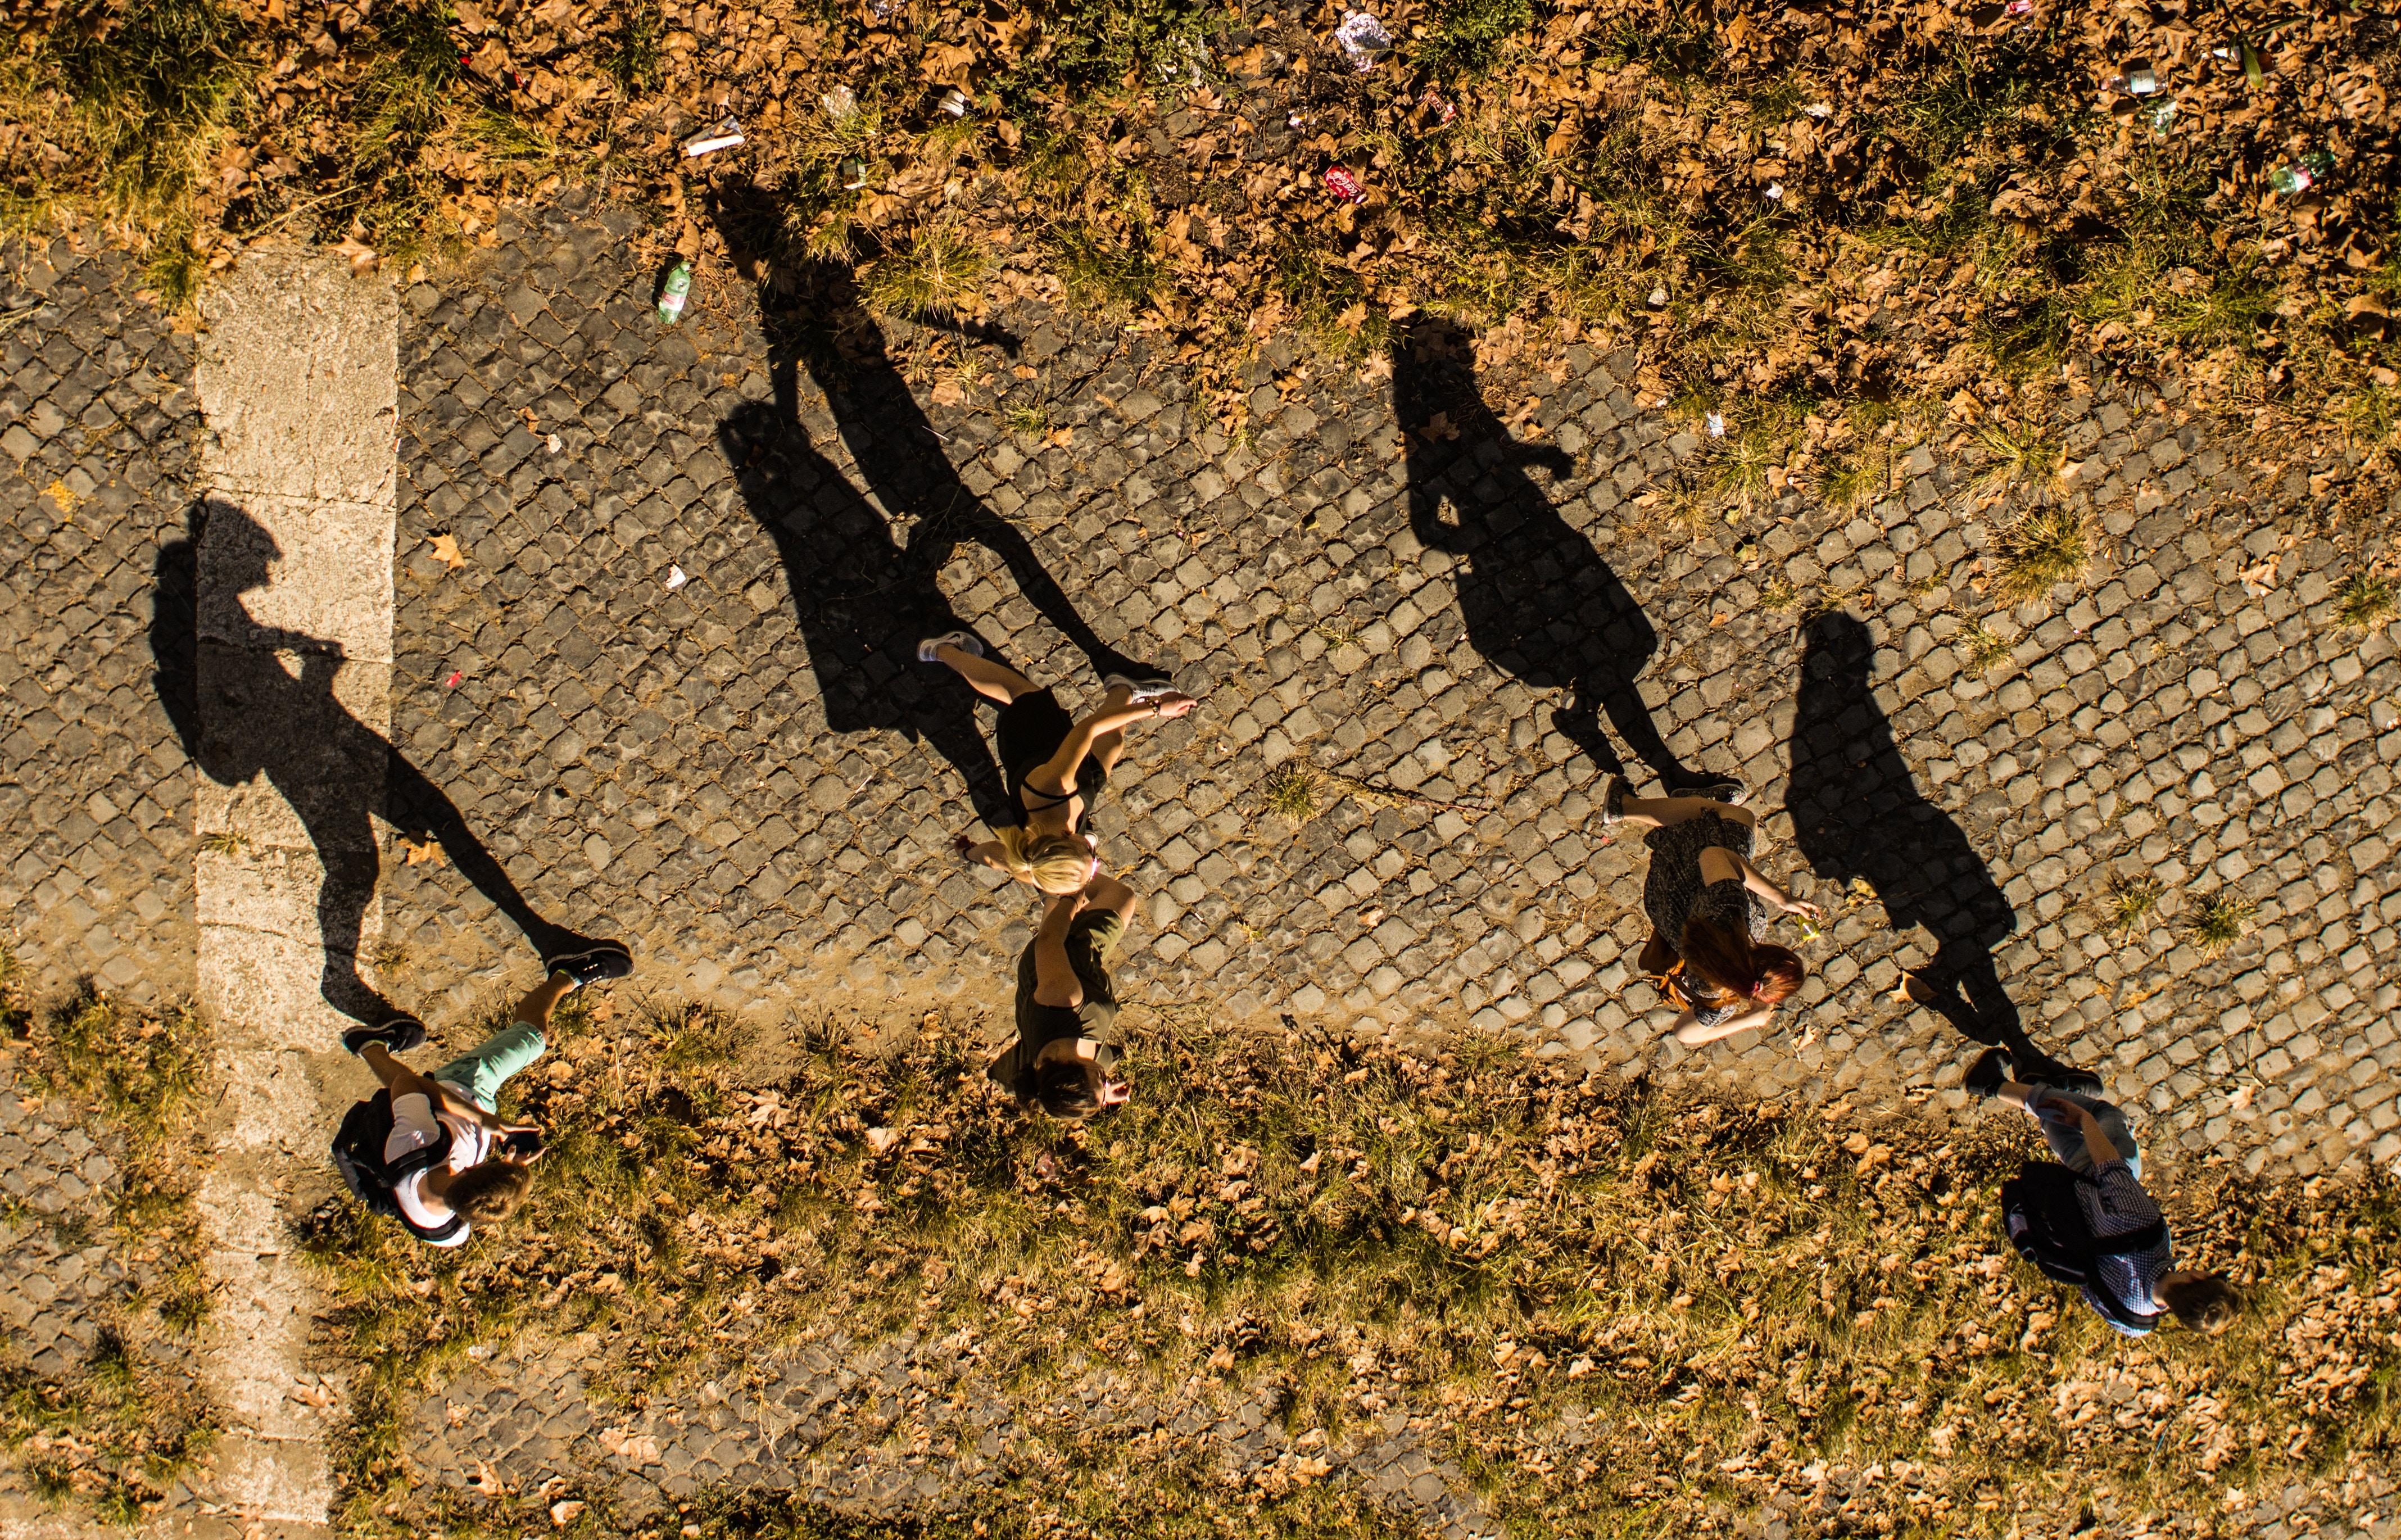 PathShadows:inbal-marilli-3425-unsplash